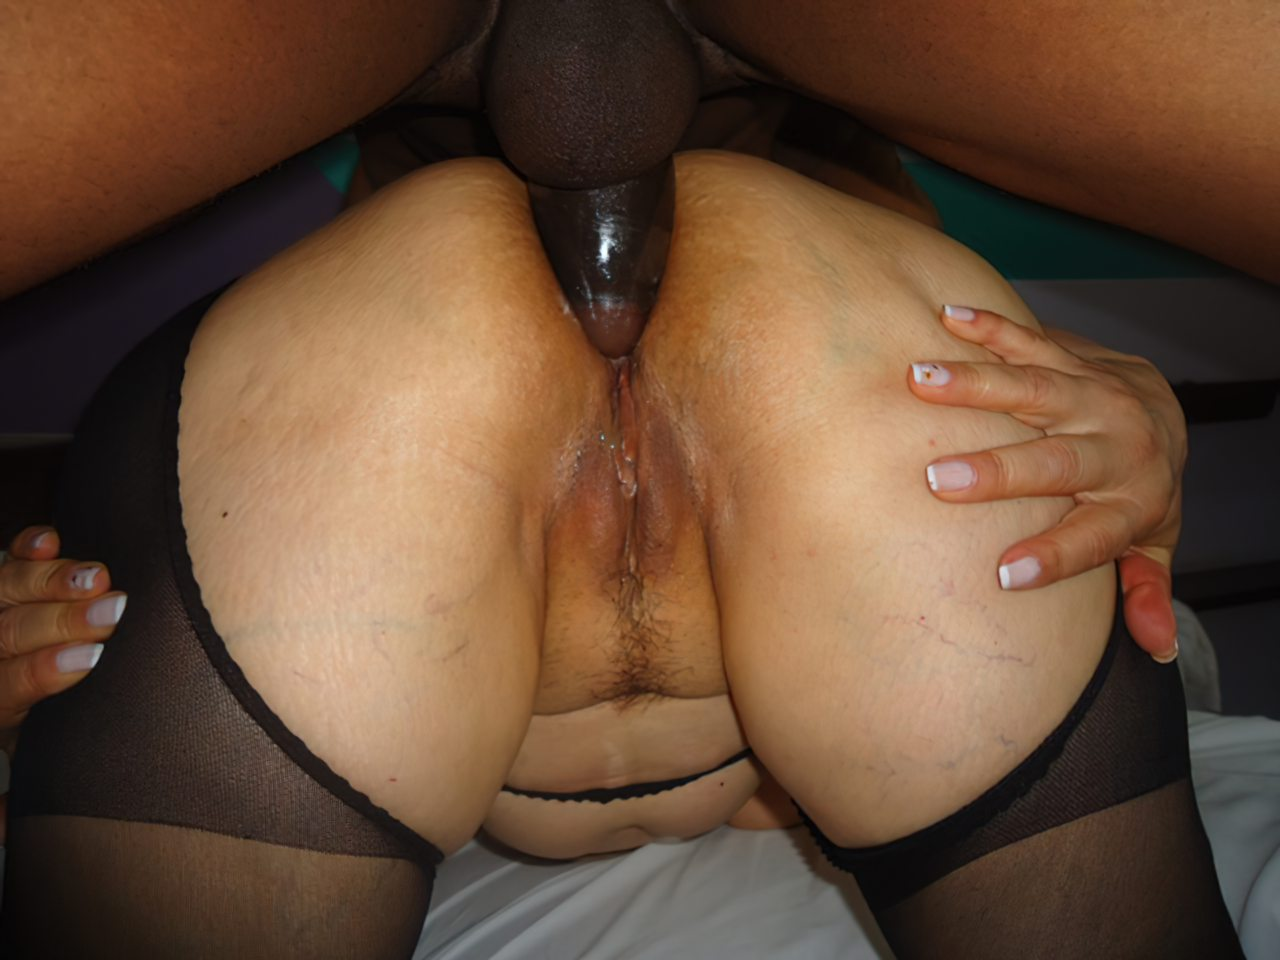 Esposa Fodendo Amante Negro (10)